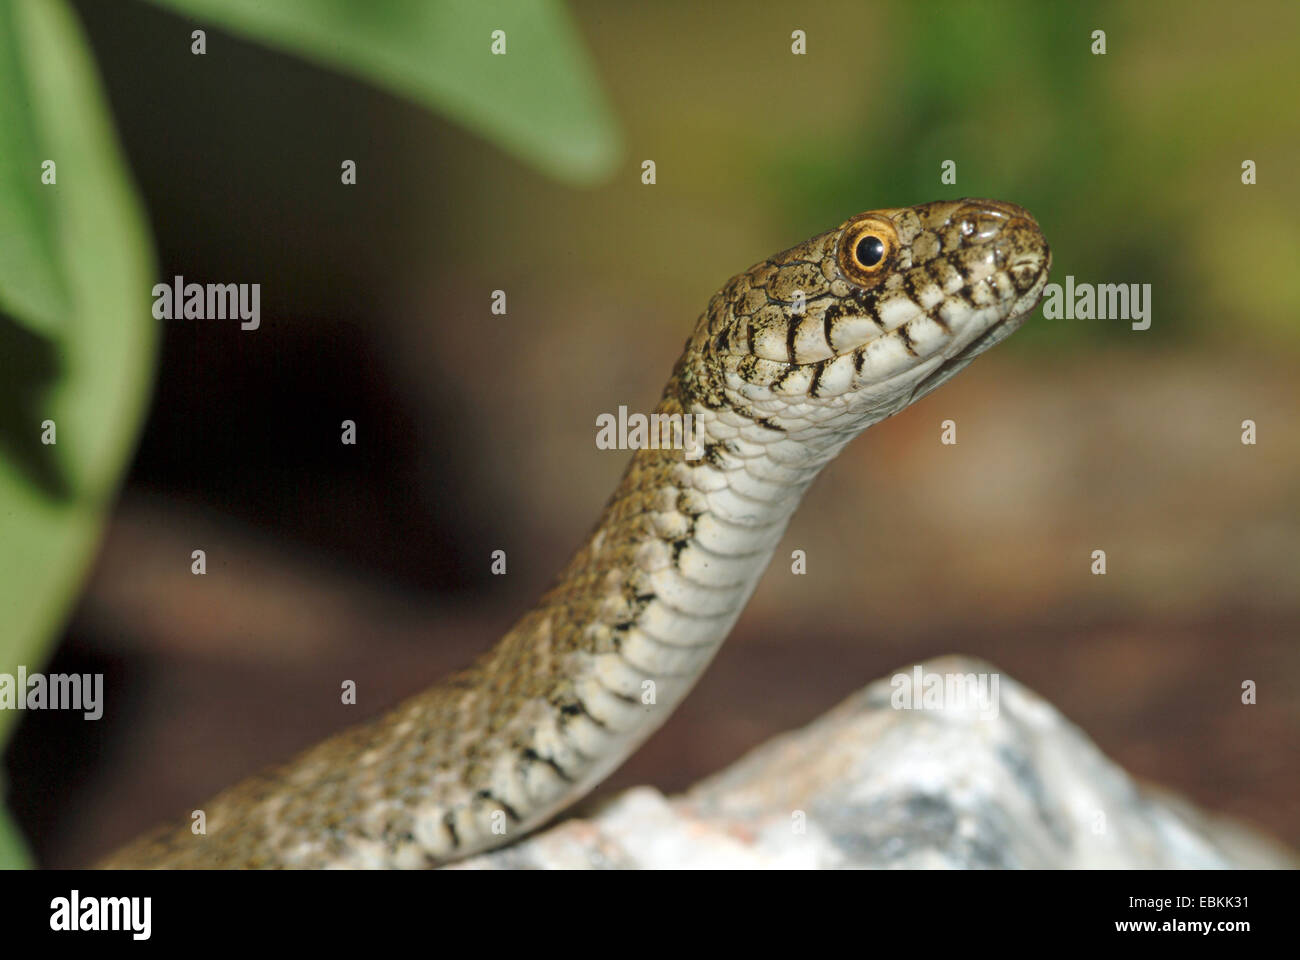 dice snake (Natrix tessellata), portrait, Germany - Stock Image